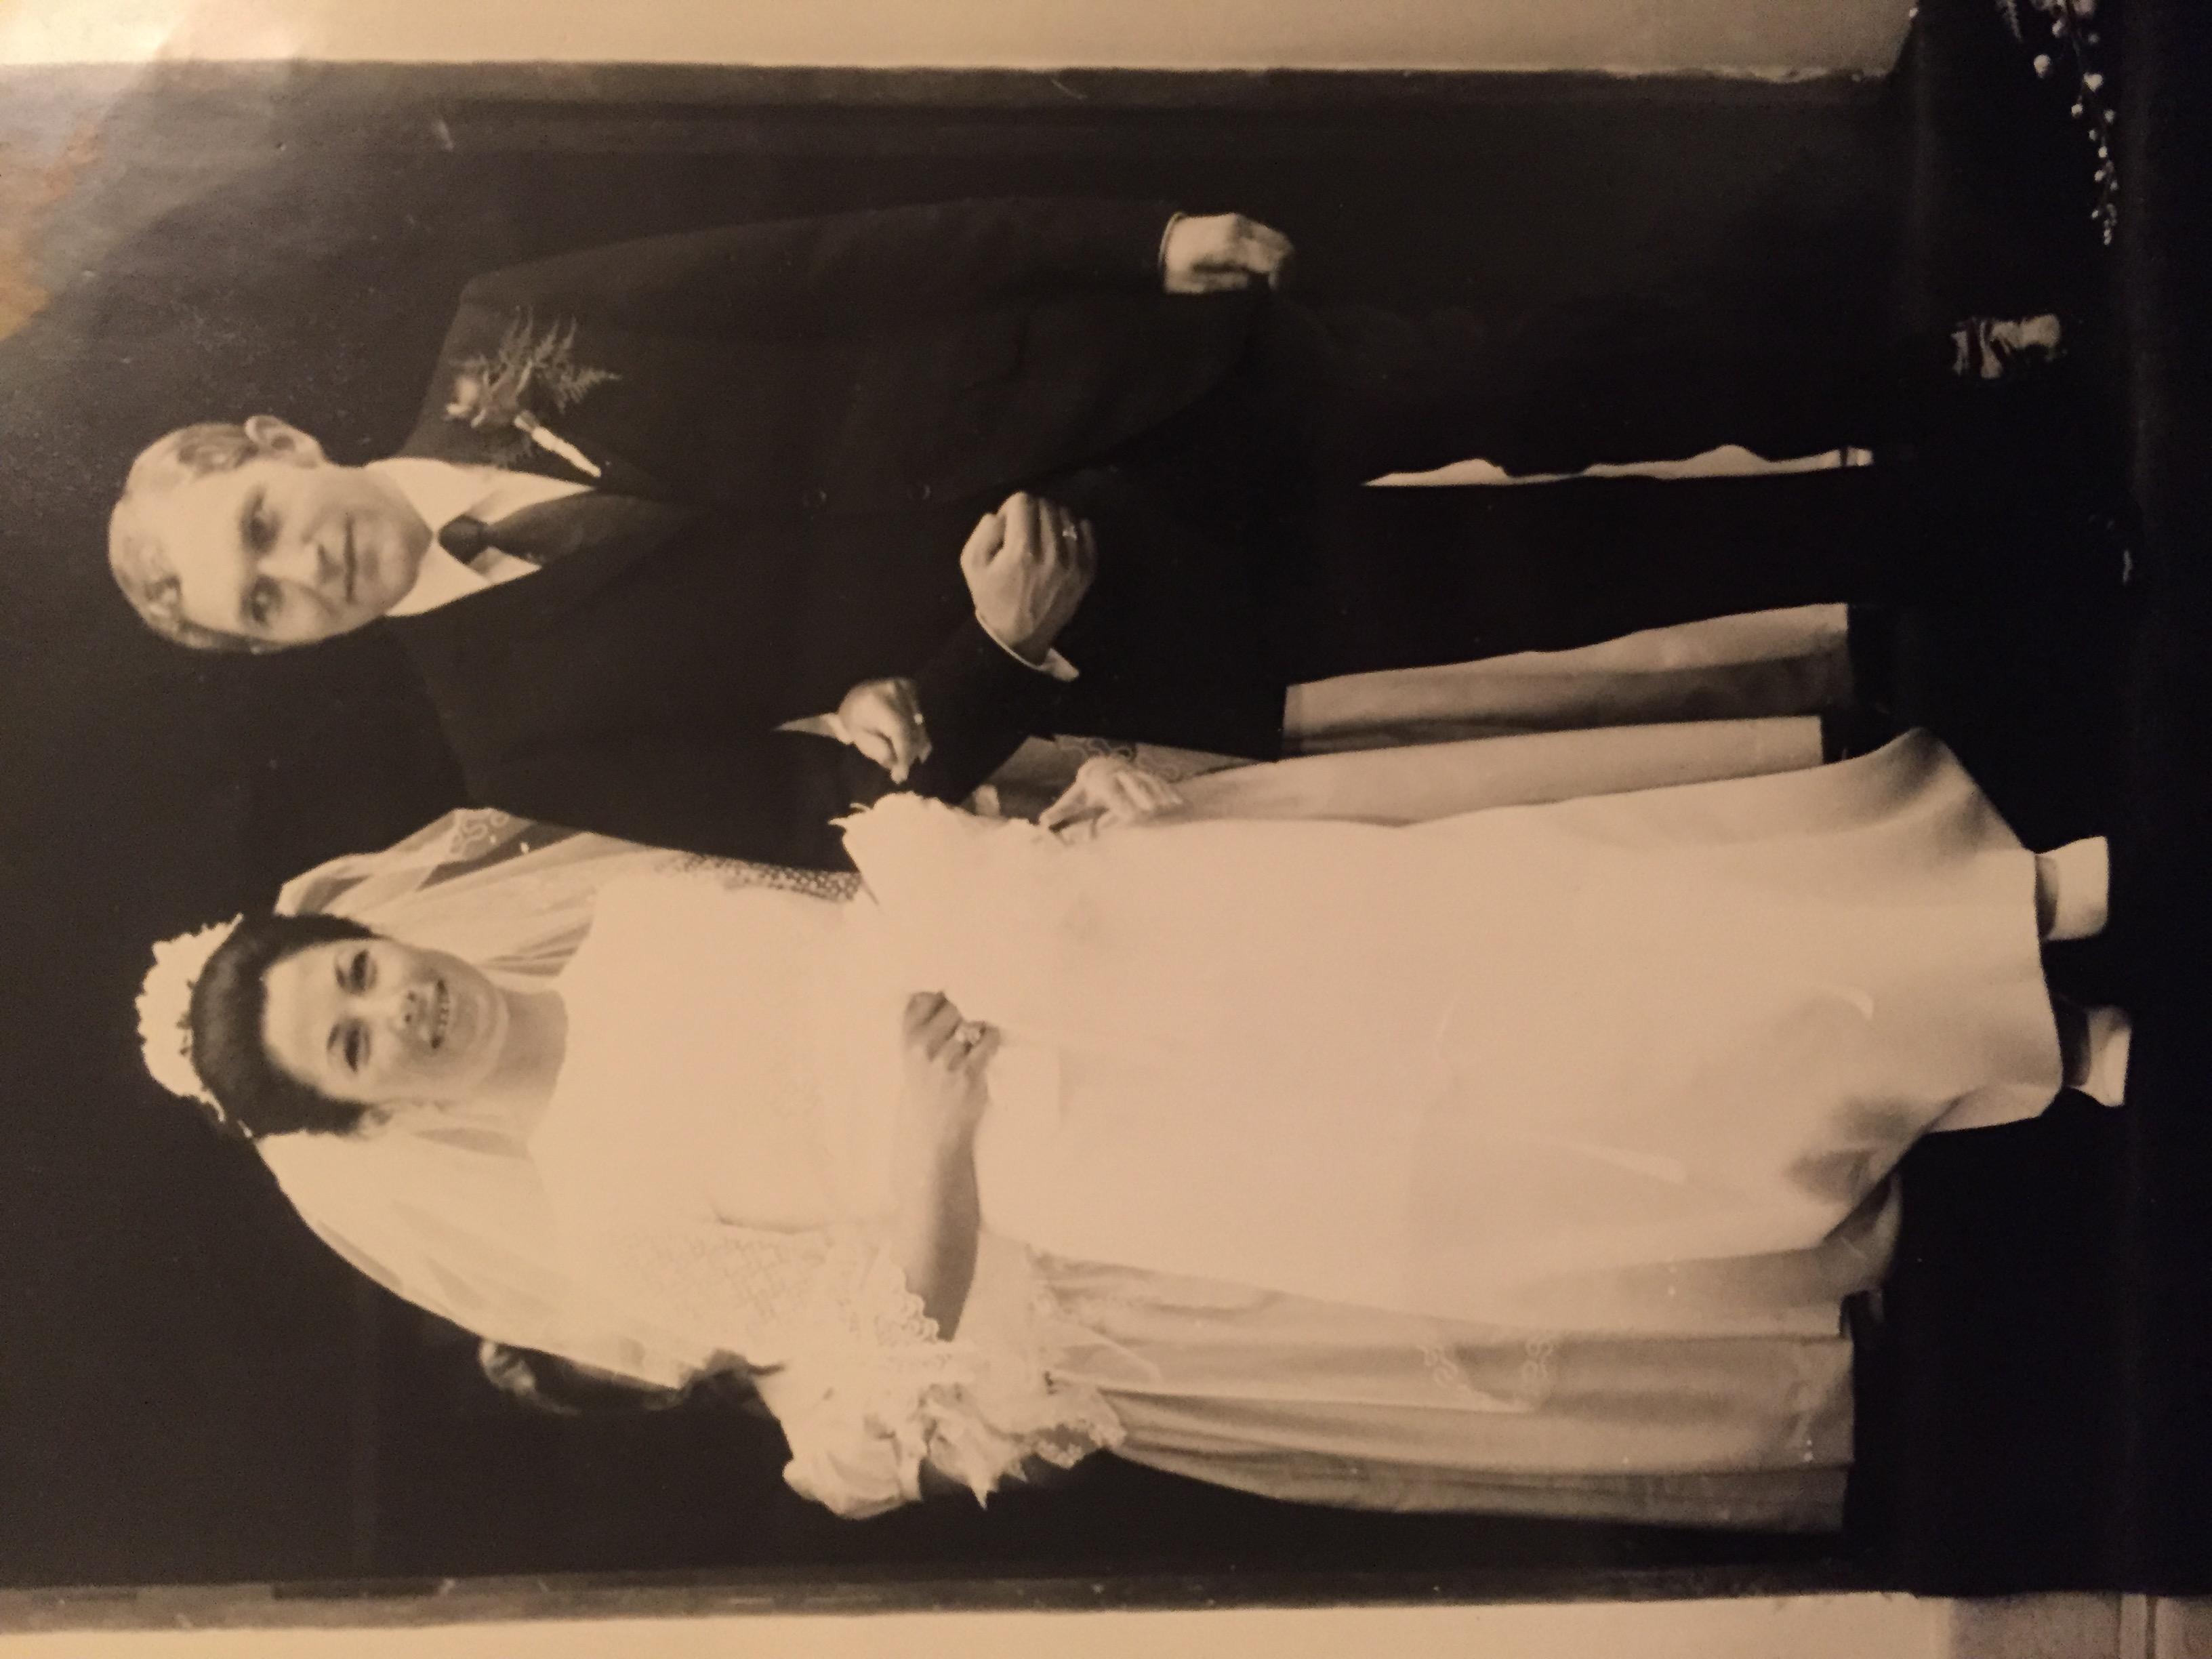 Mum & Dad's wedding in Rabat, Morocco, 1971